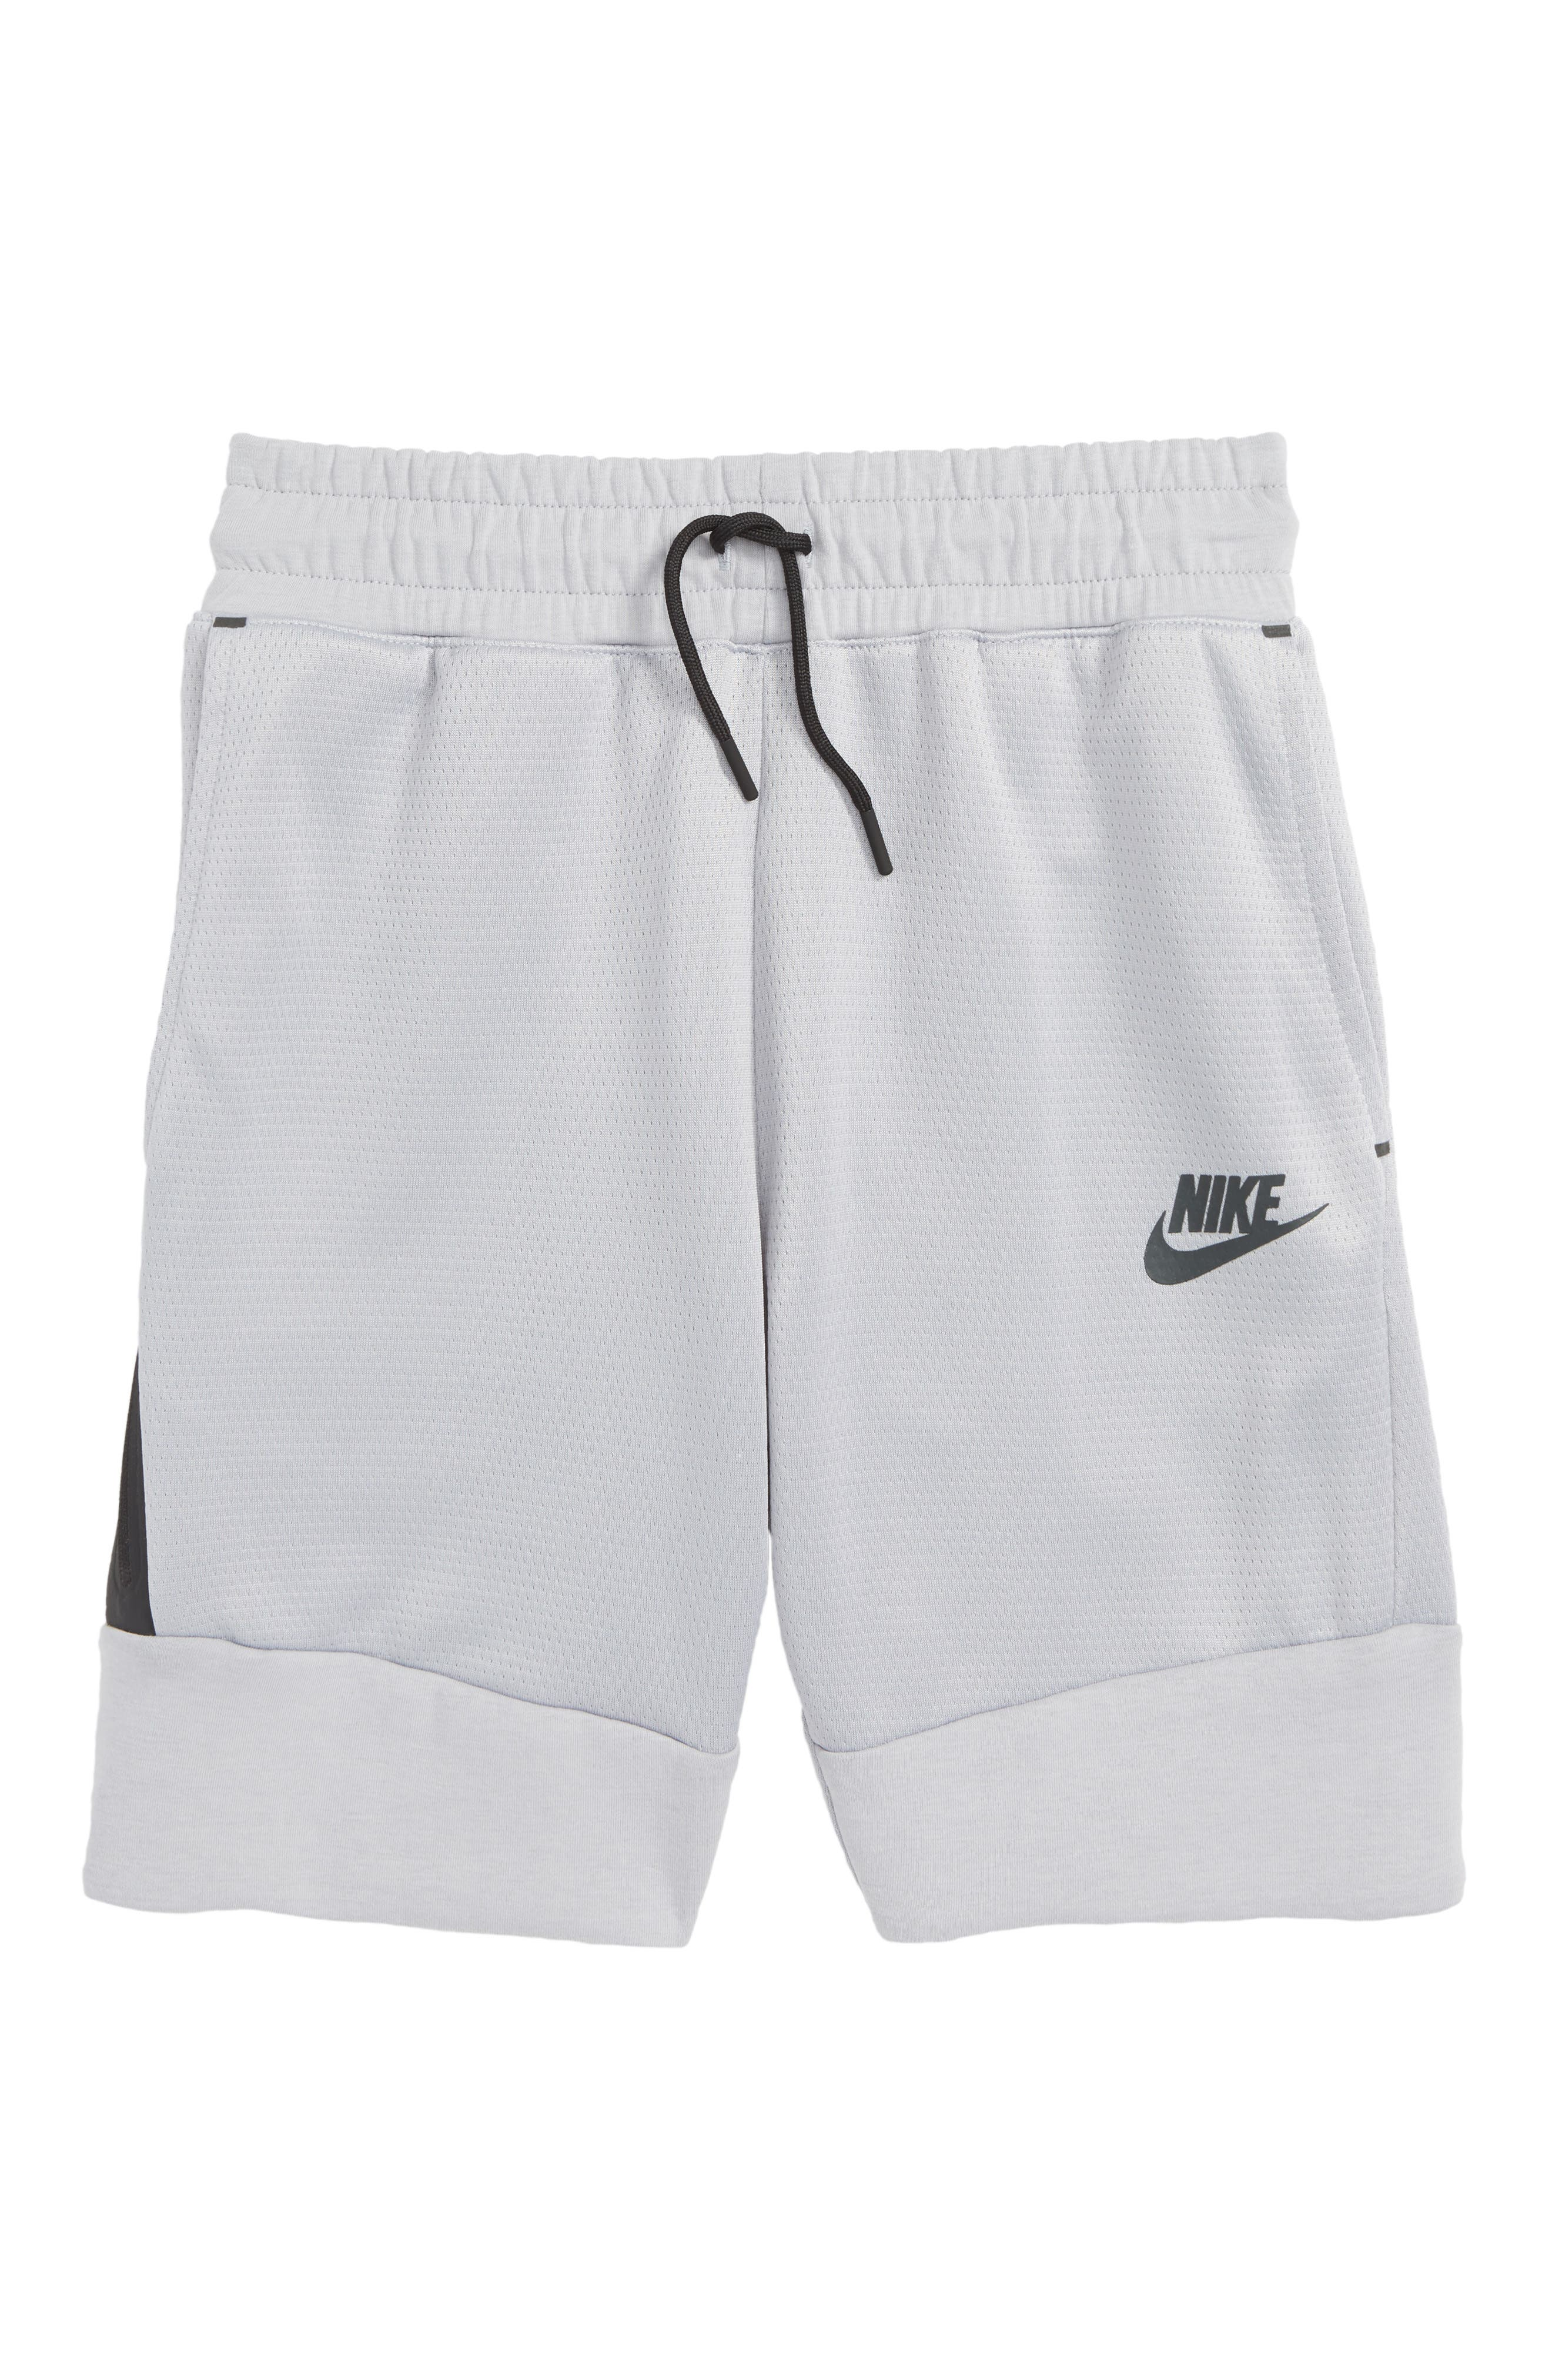 Sportswear Tech Fleece Shorts,                             Main thumbnail 1, color,                             WOLF GREY/ ANTHRACITE